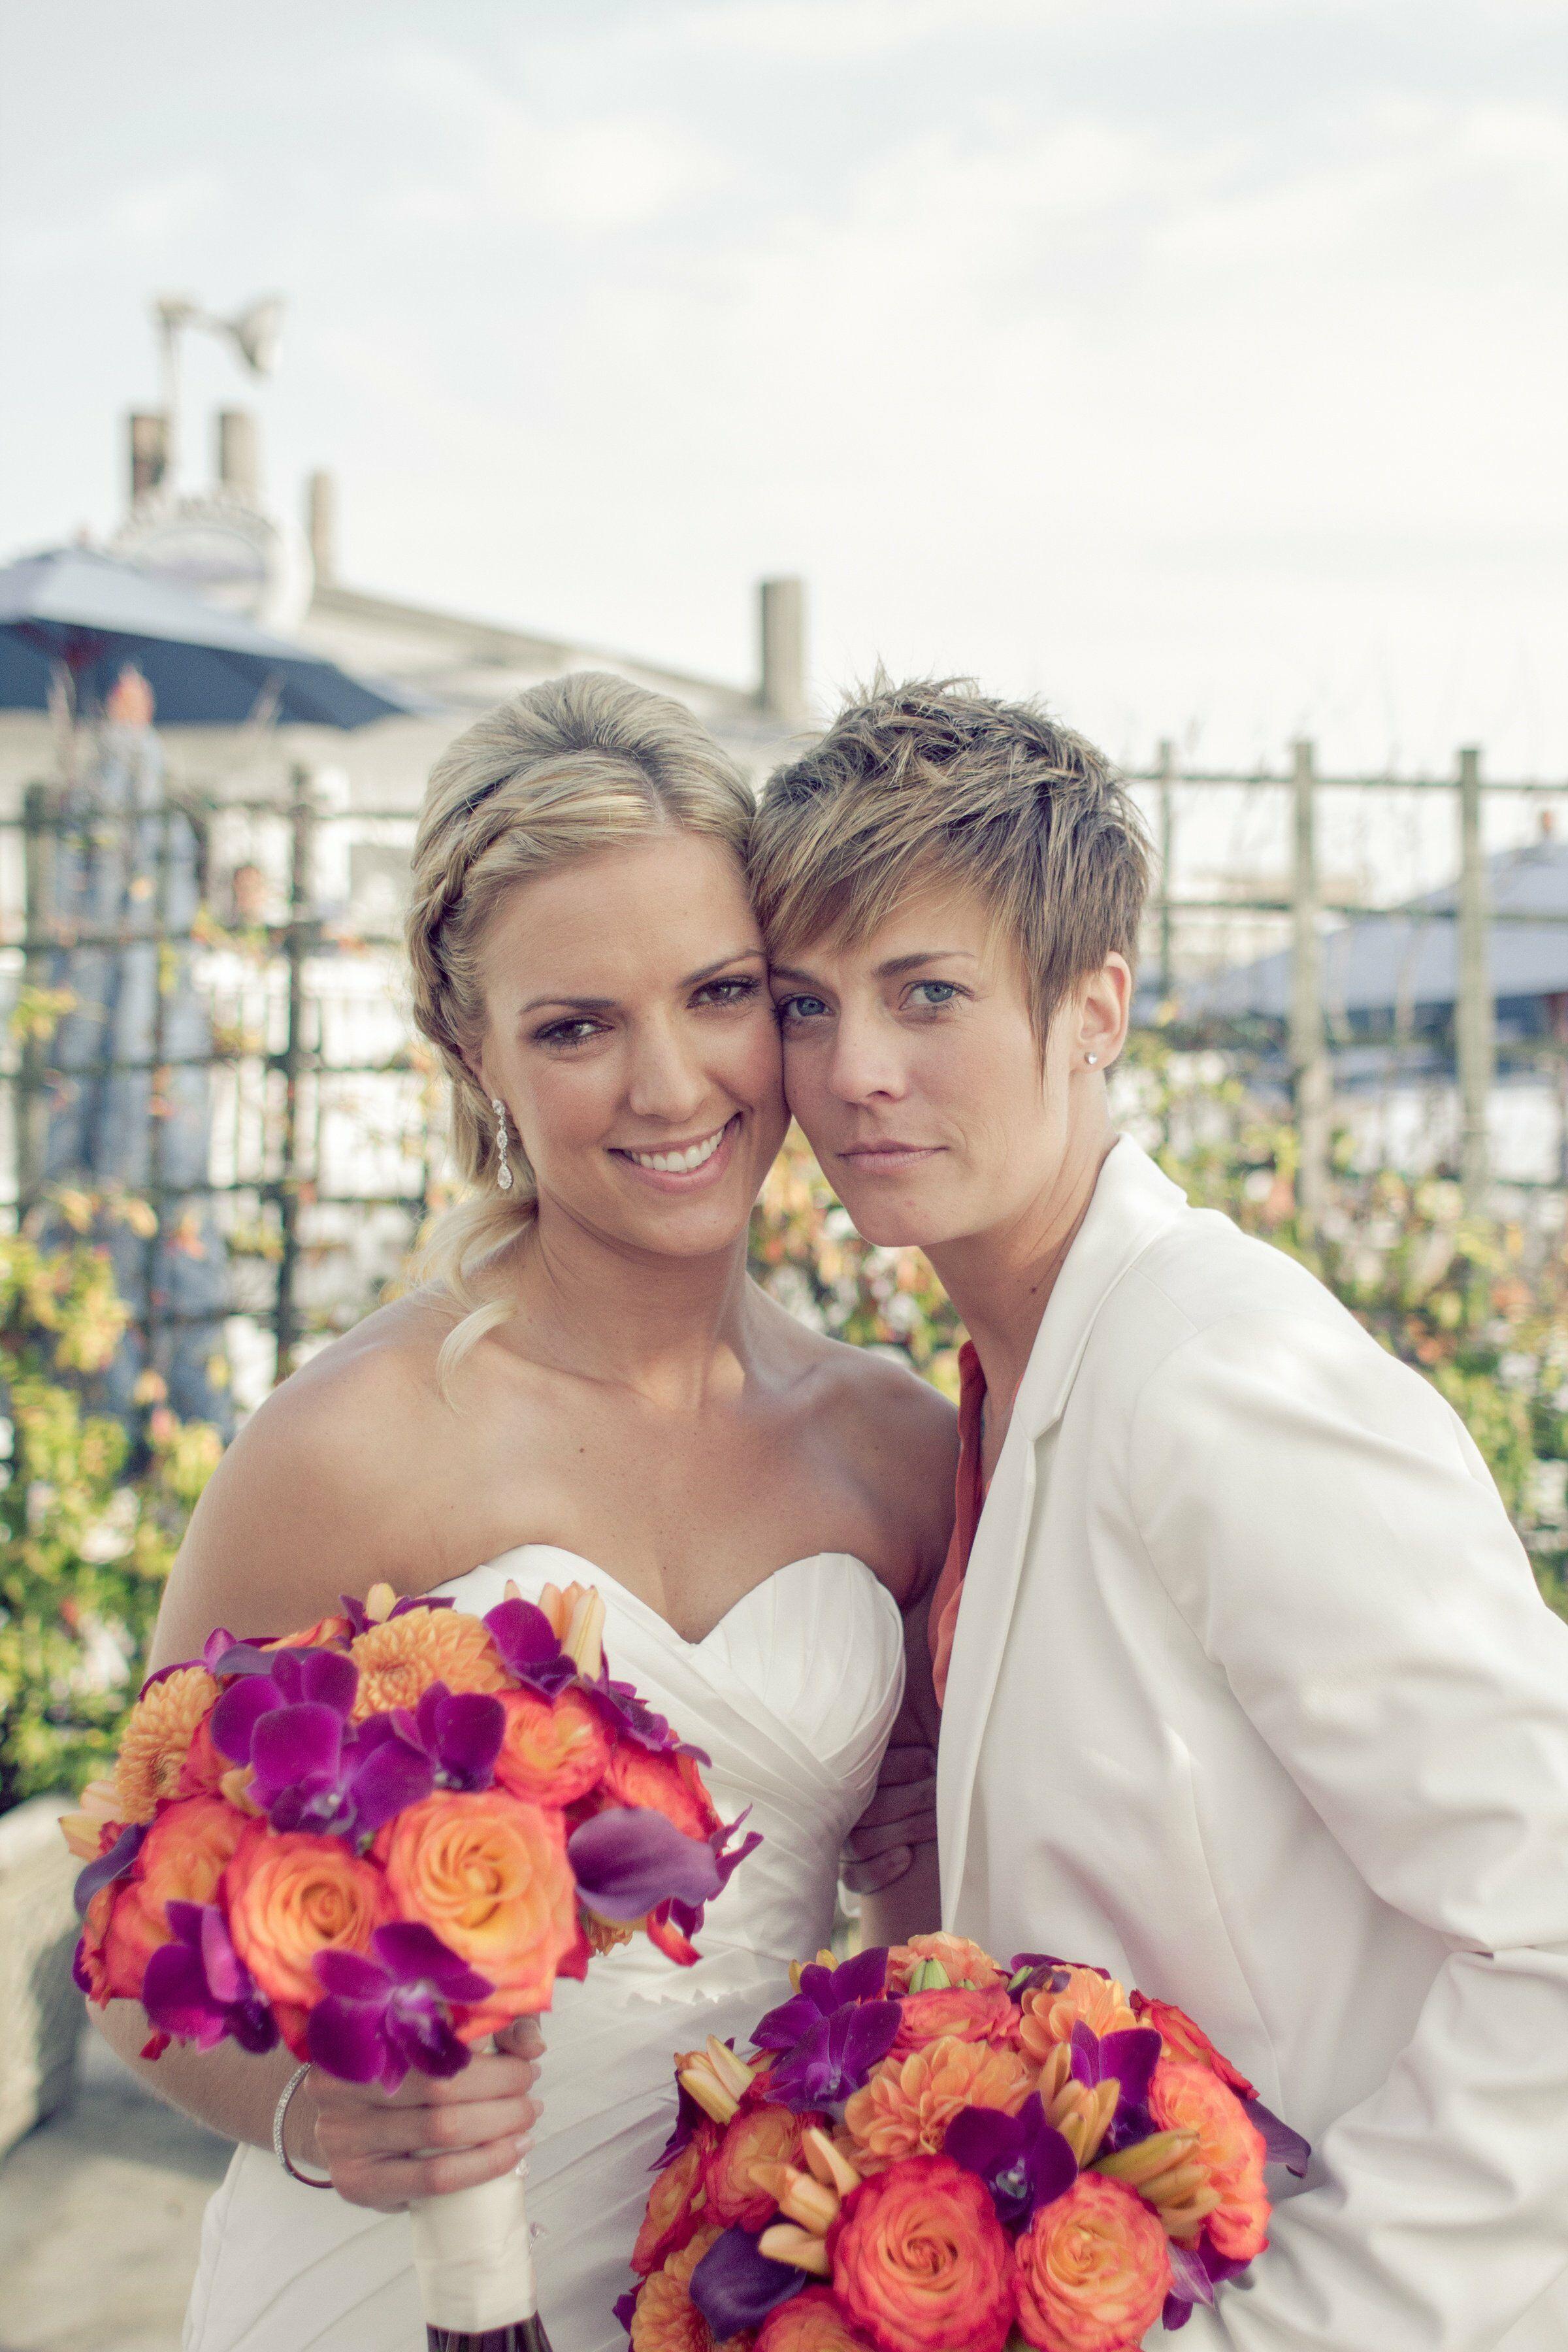 A Romantic, Outdoor Wedding In Laguna Beach, Ca-8090